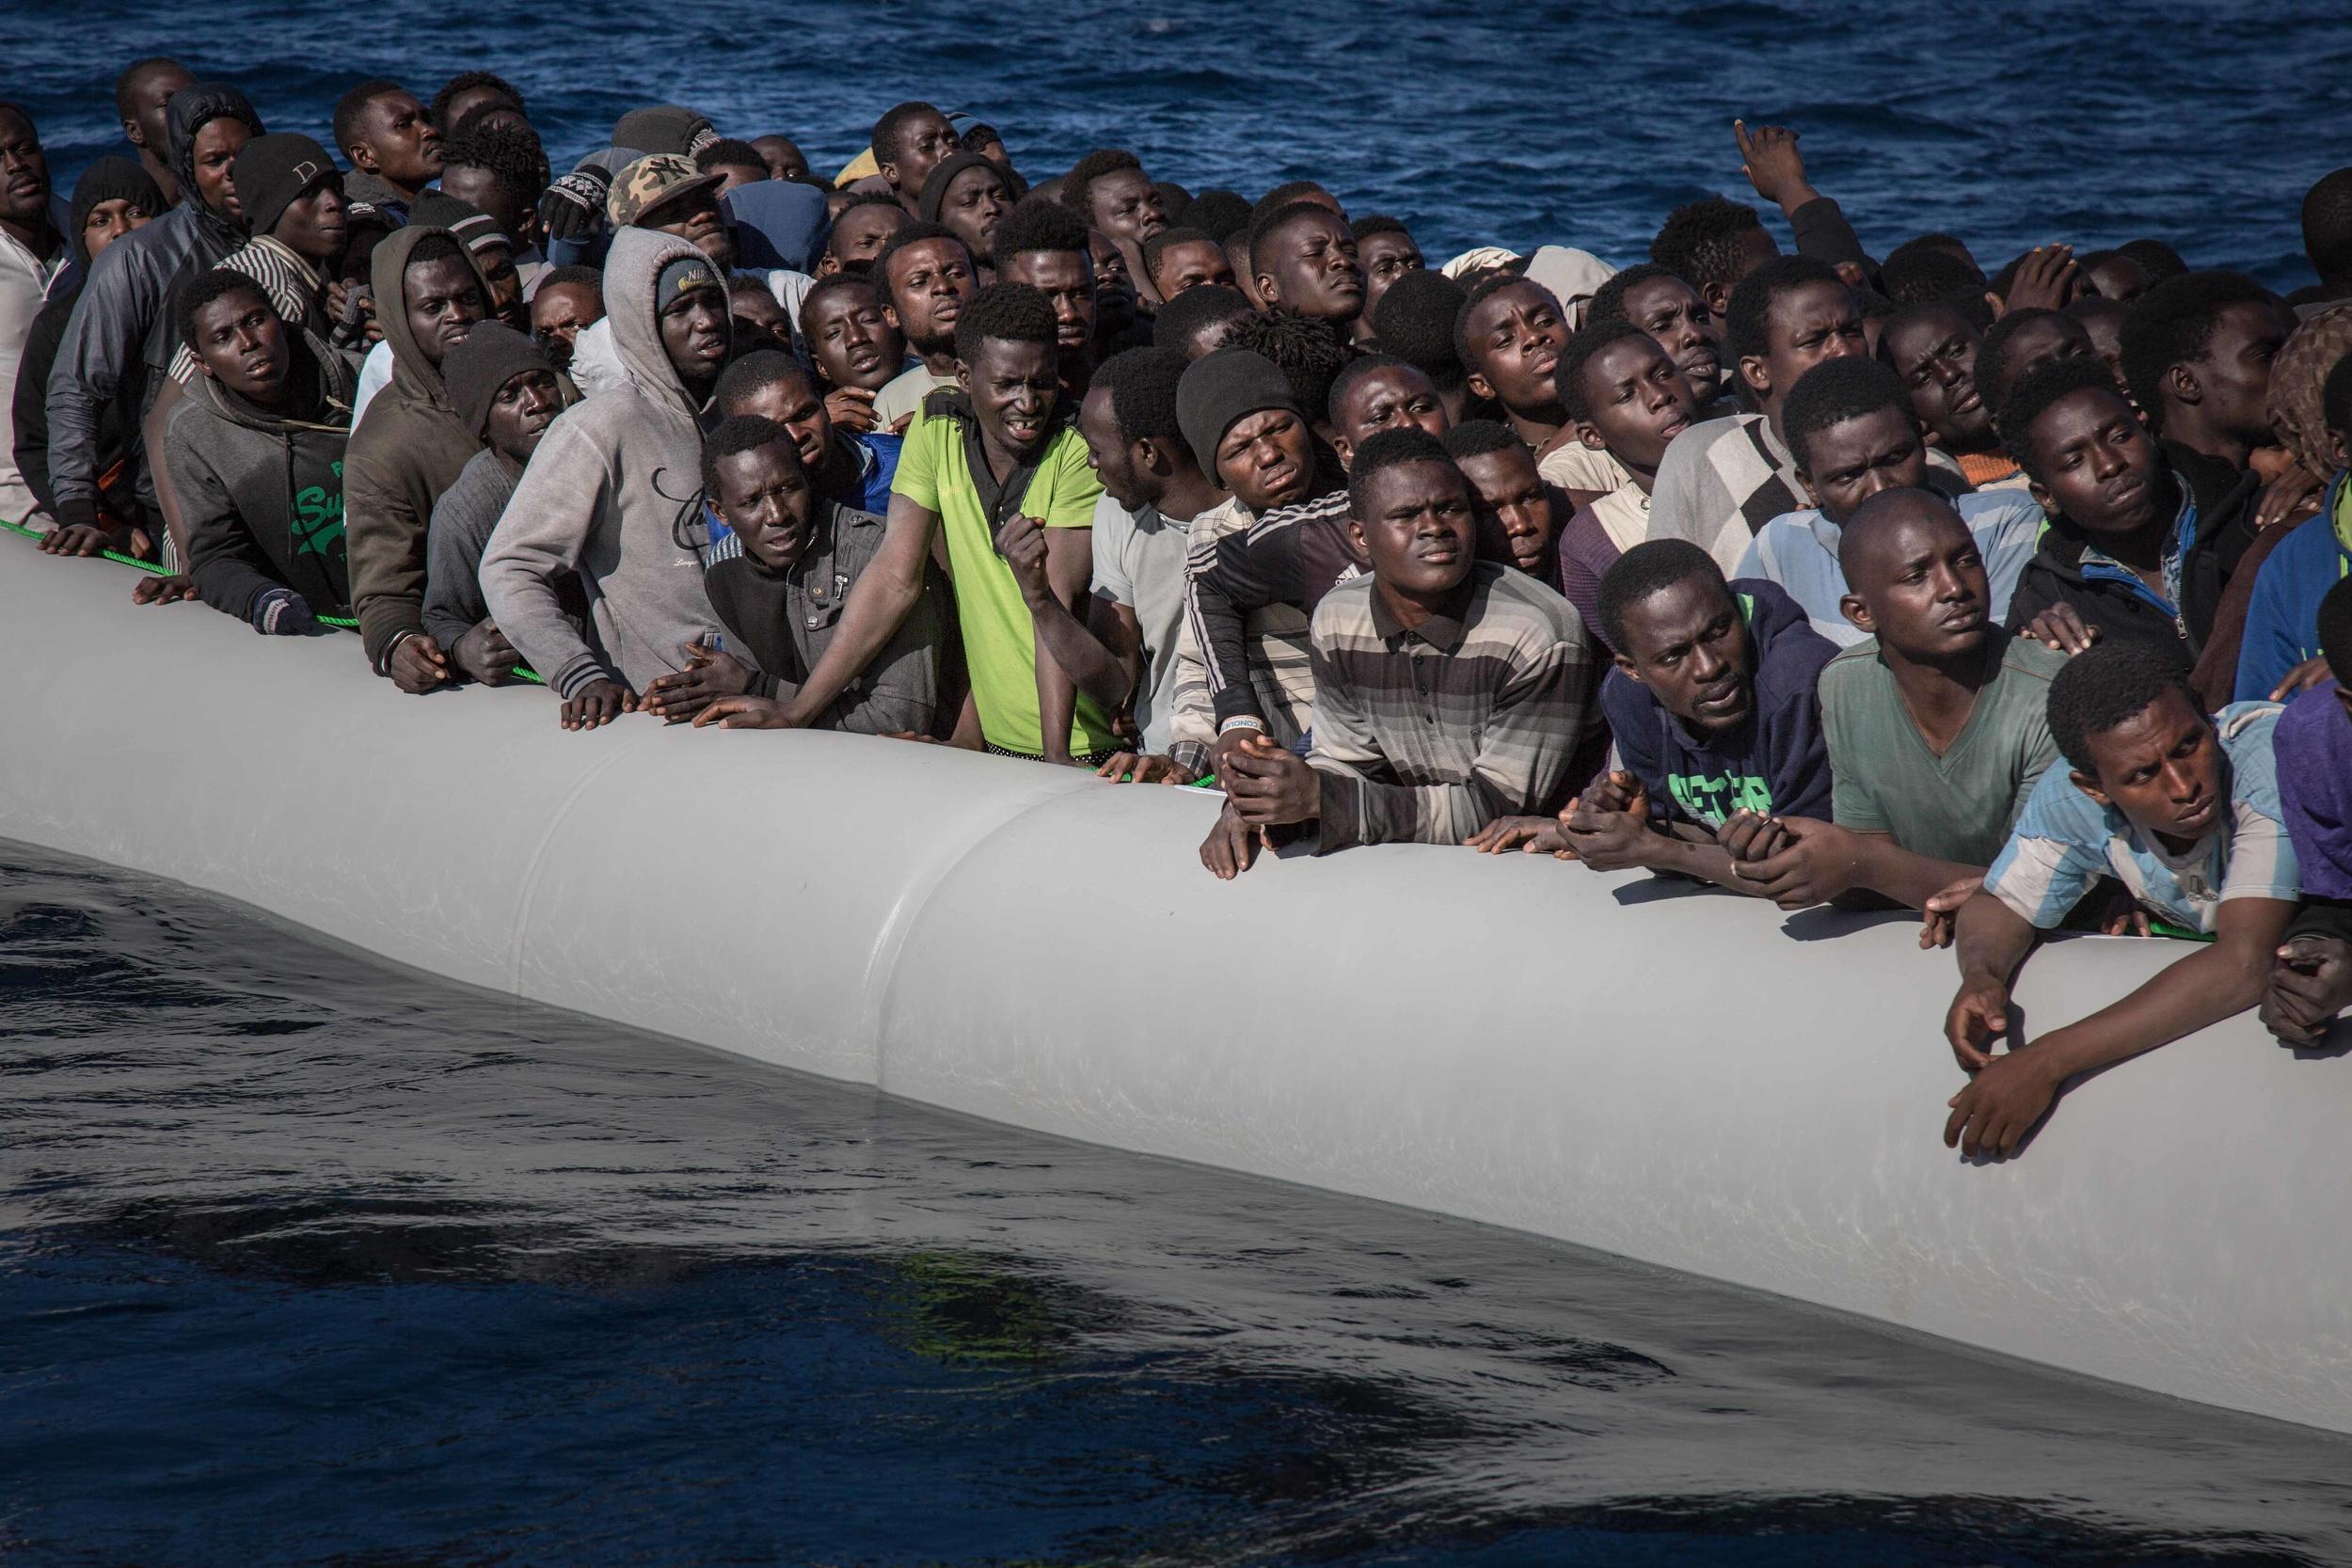 لاجئين فى انتظار الانقاذ